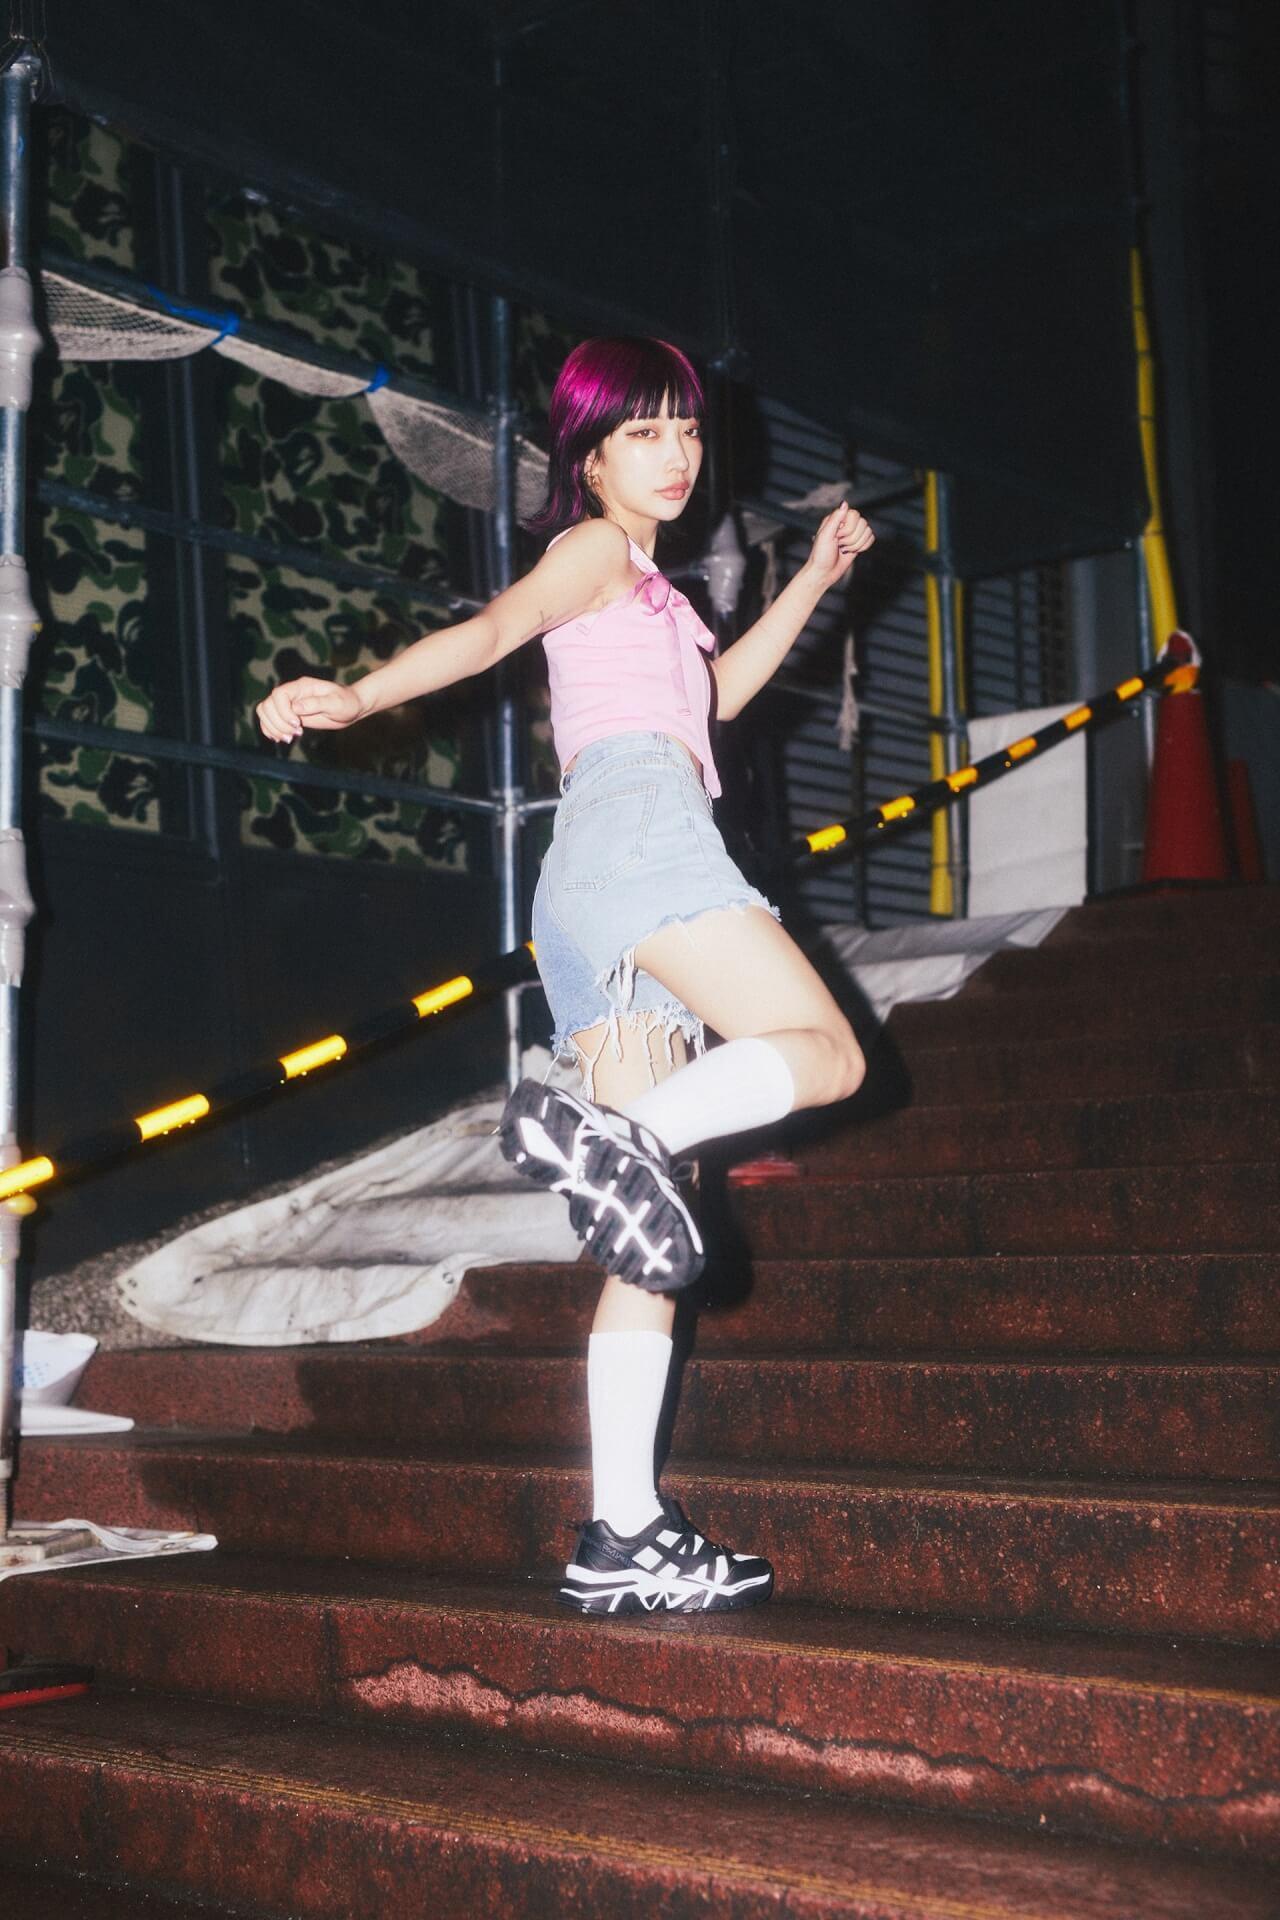 KATY×FILA×atmos pinkトリプルコラボの『Z BUFFER 2』が発売決定!KATYとチェキ撮影イベントも Fashion210629_katy20